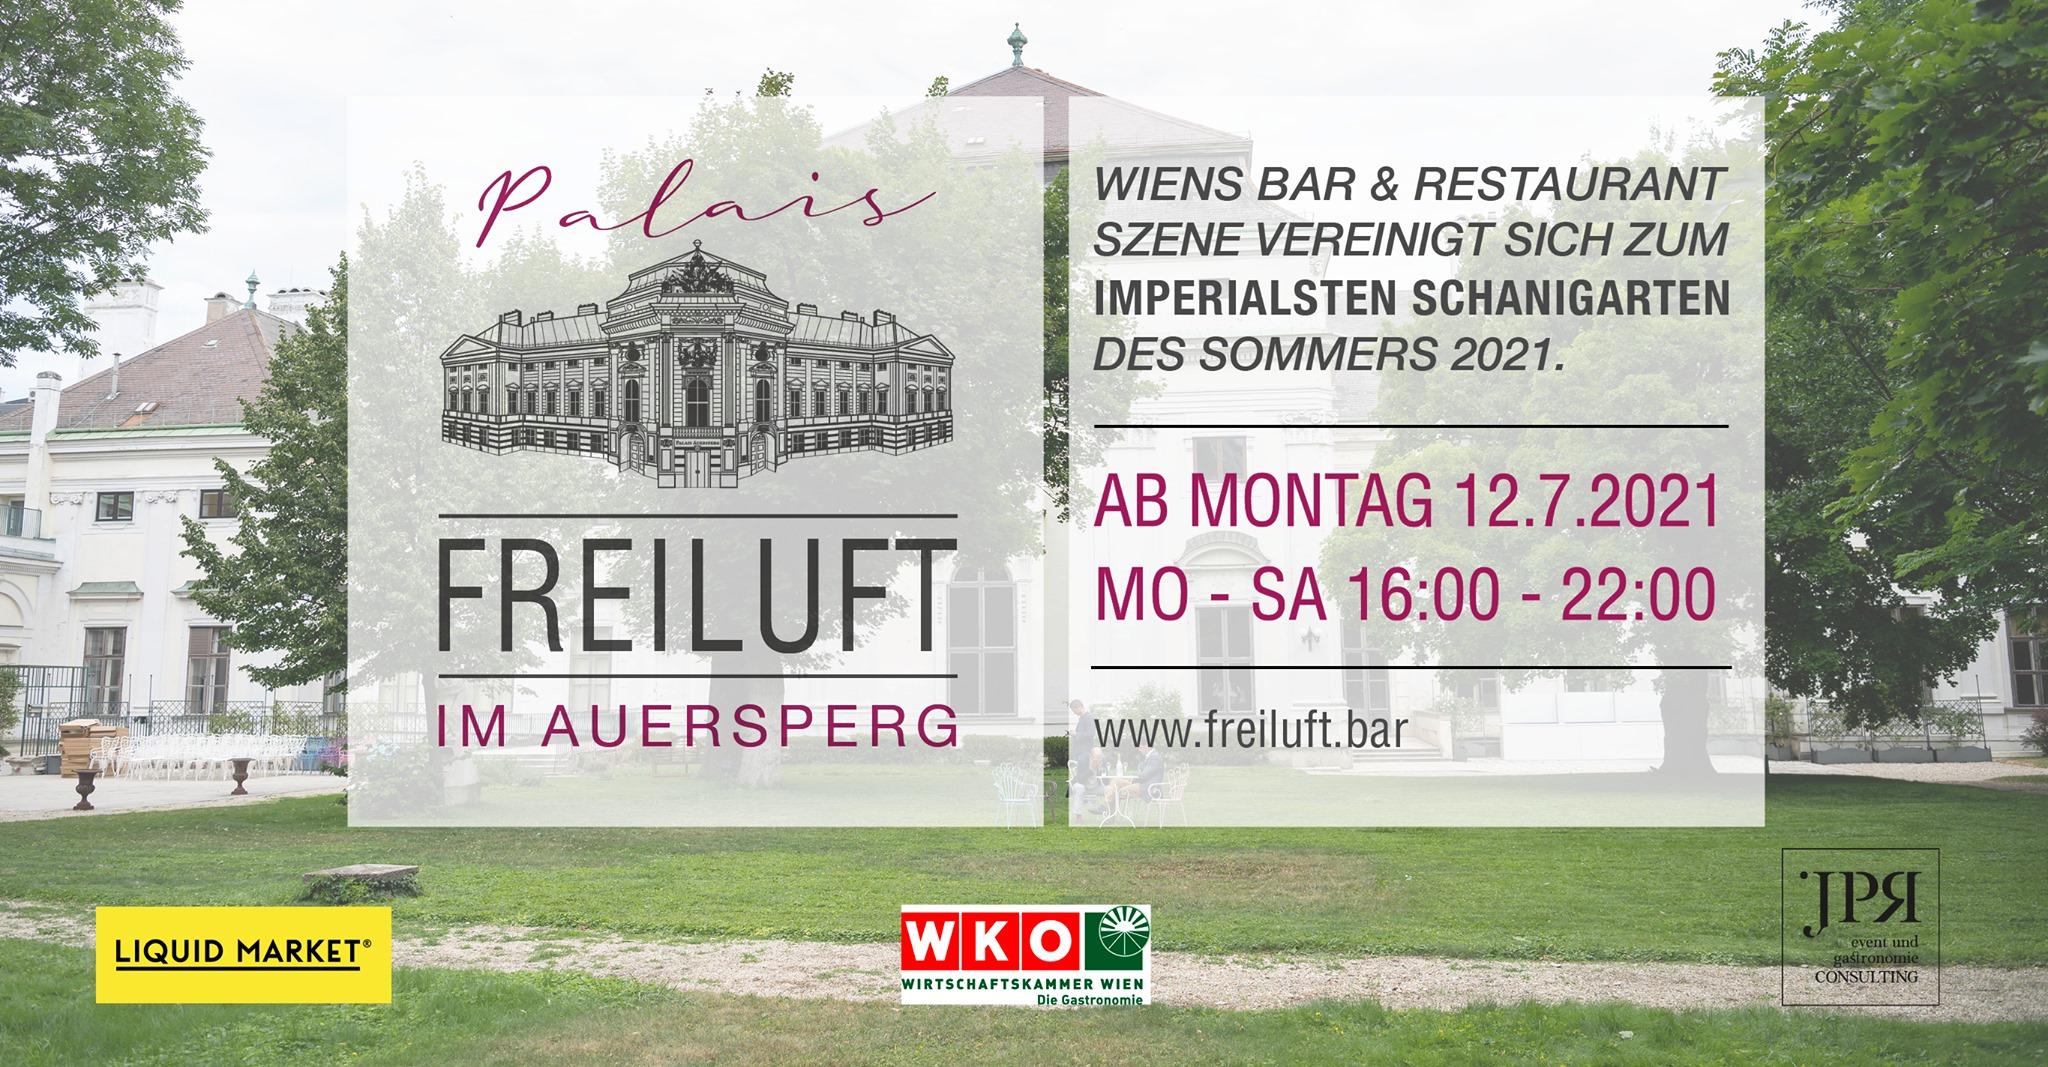 Events Wien: Palais Freiluft – der Sommer(Schani-) garten im Palais Auersperg